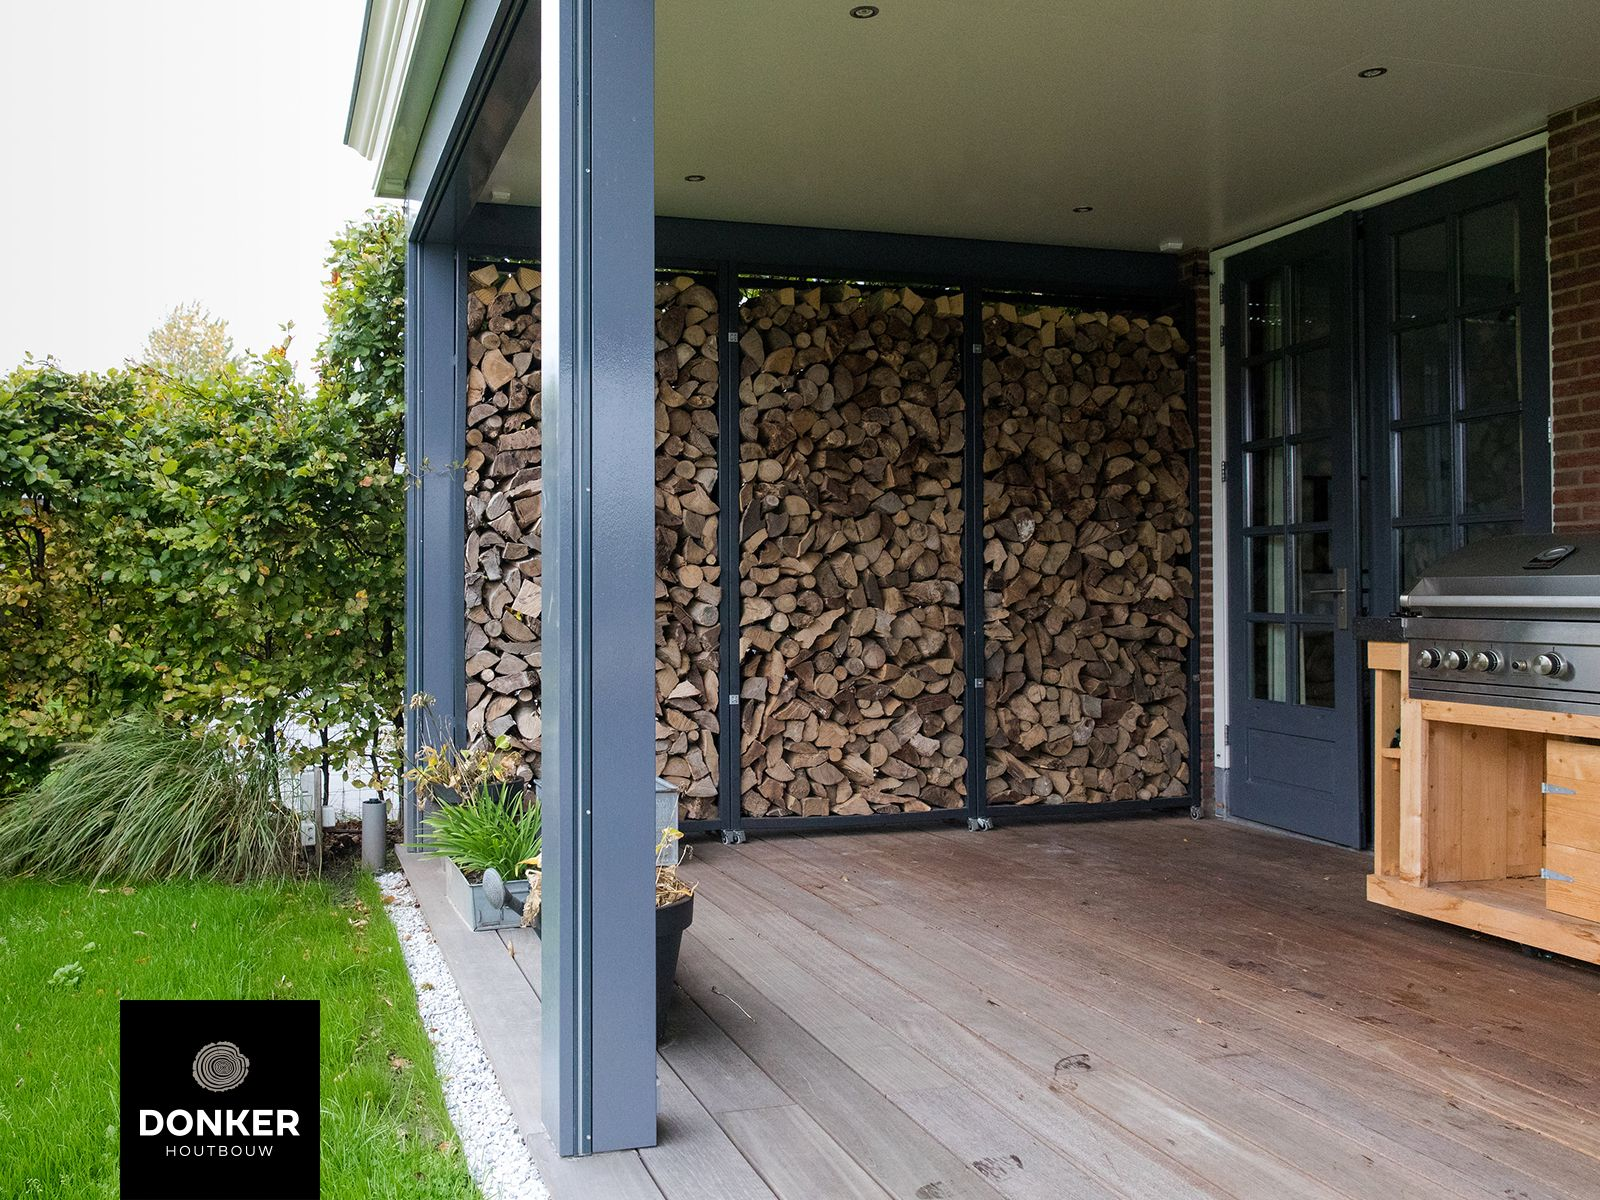 Donker Houtbouw Klassieke veranda Vlondervloer Buitenkeuken